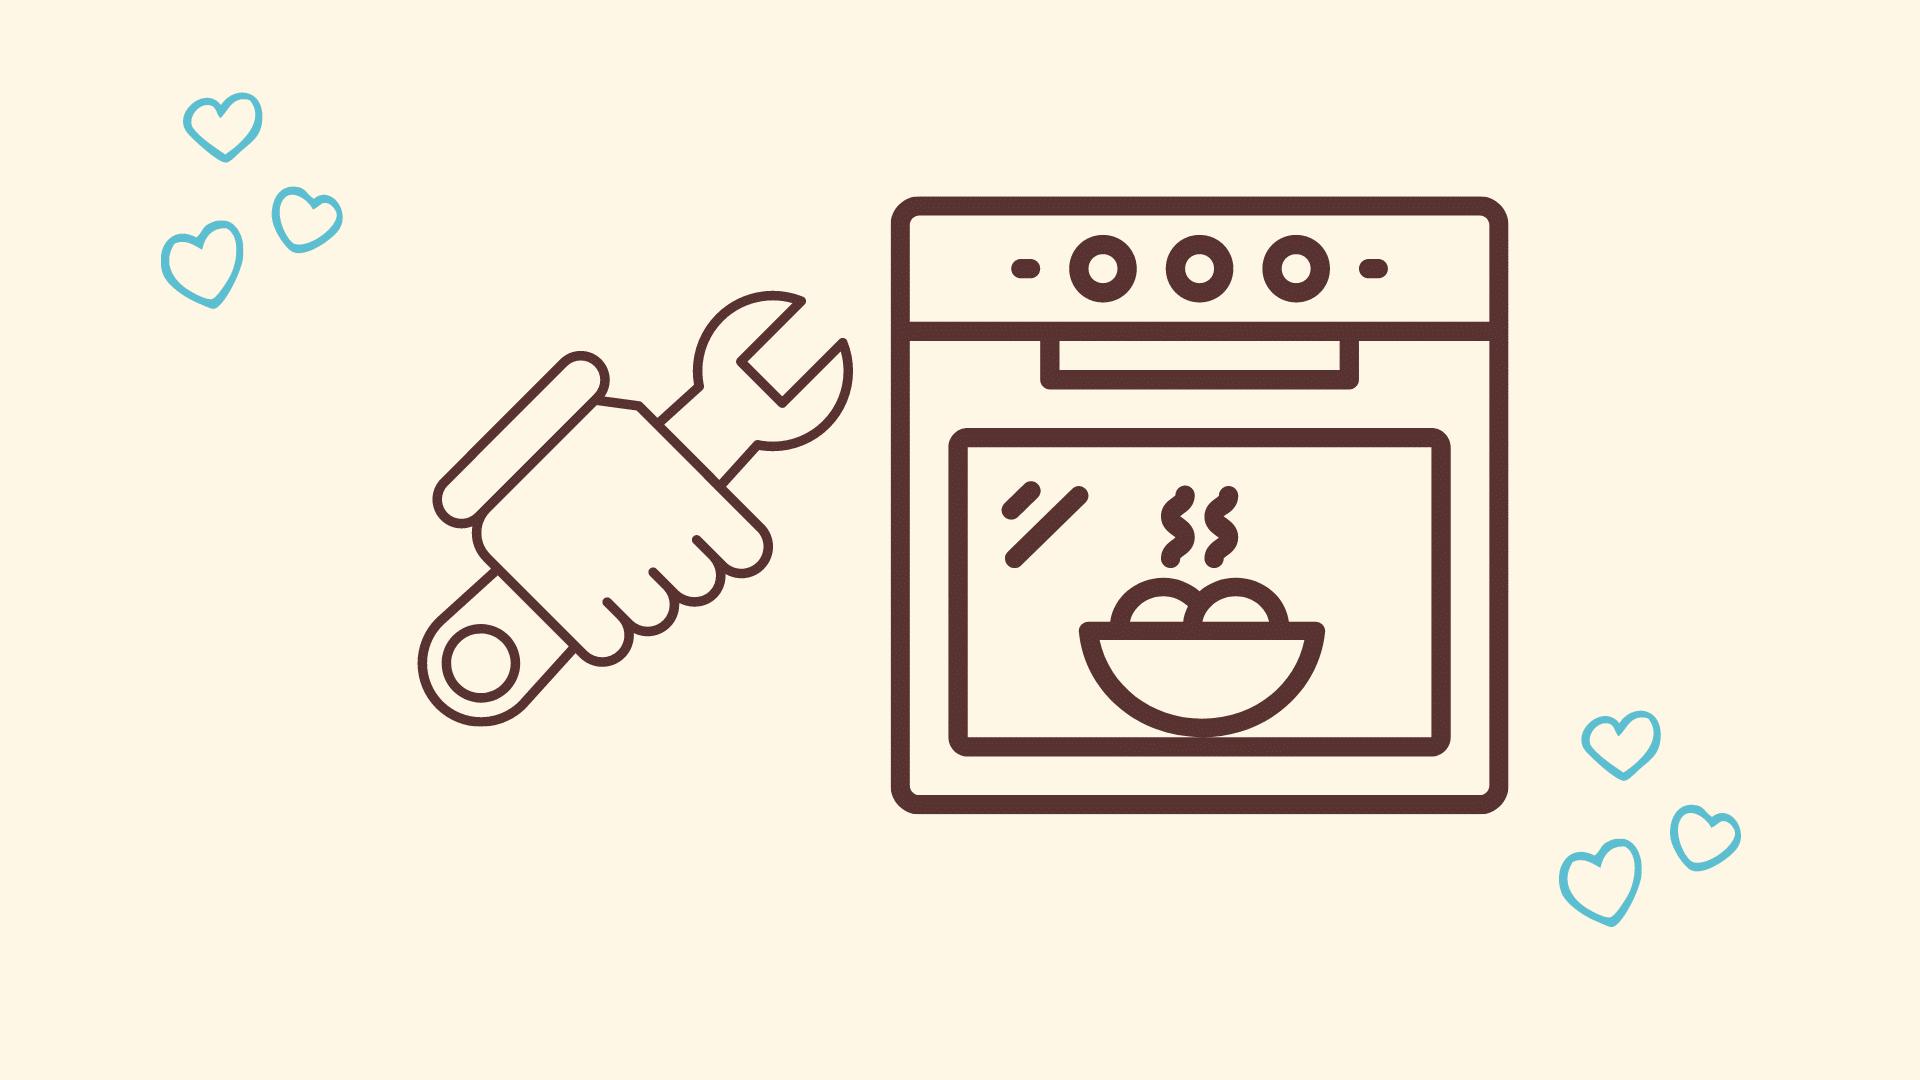 Best Oven Repair Service